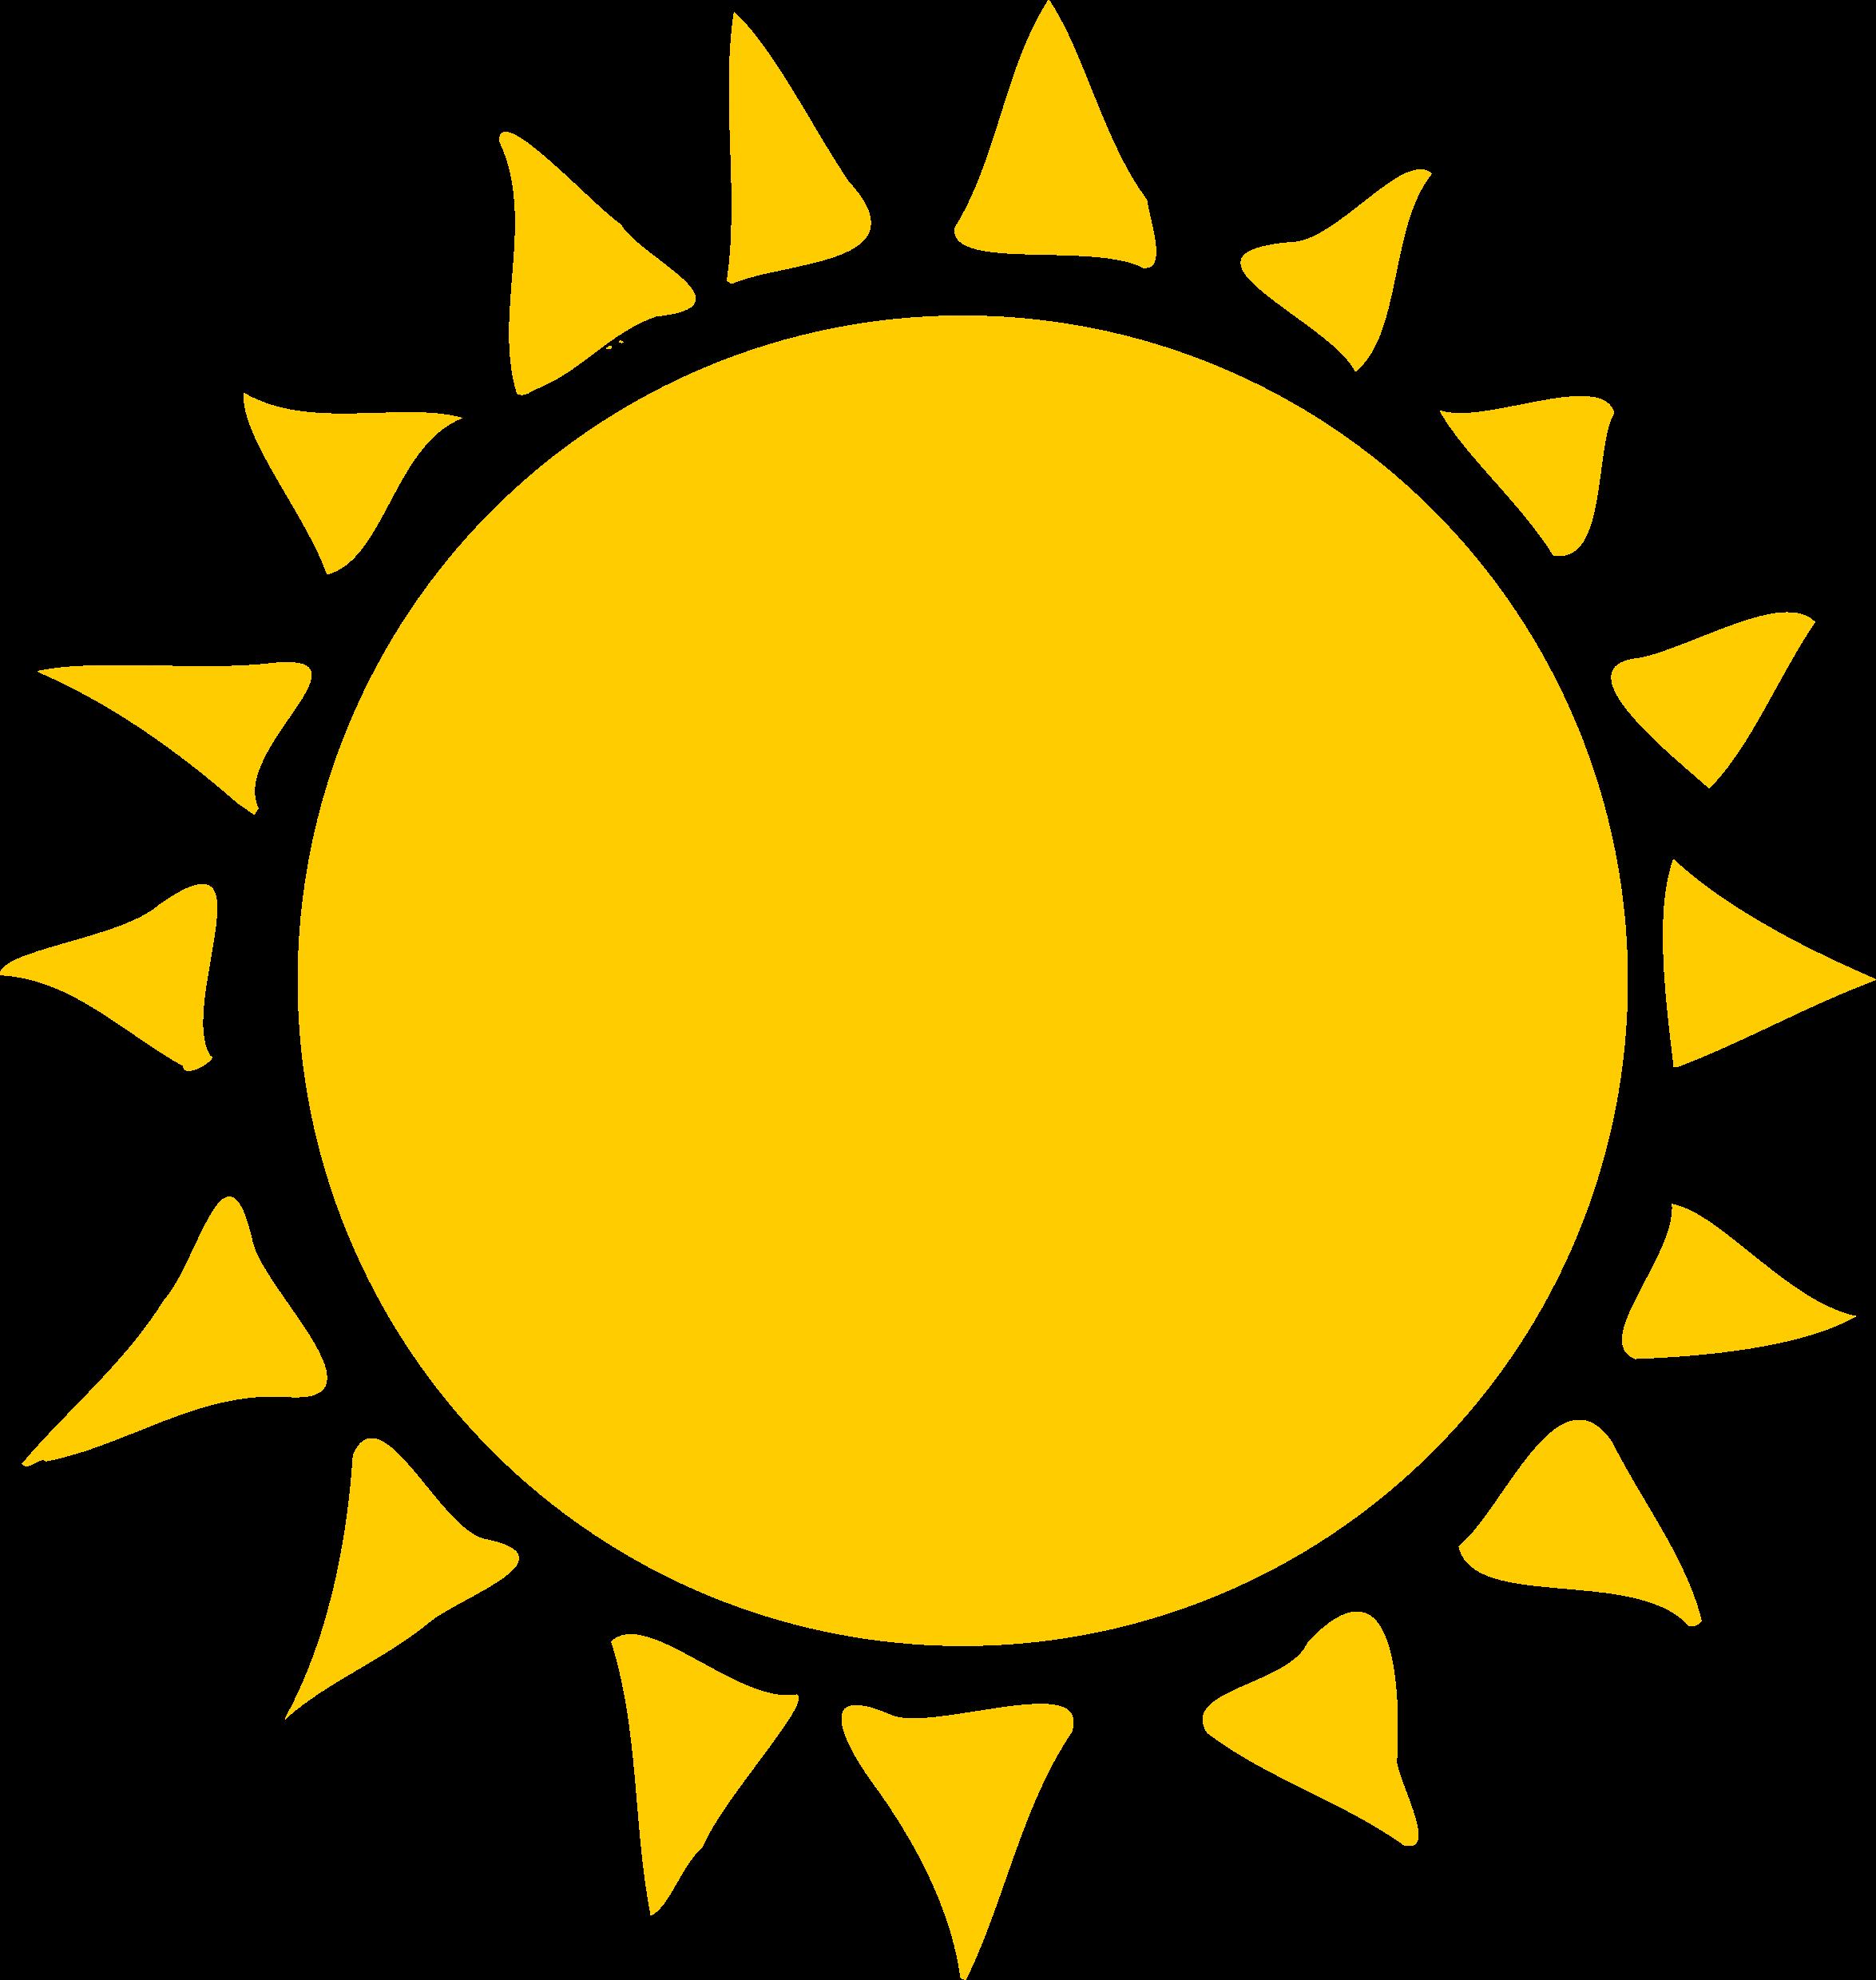 2020 New Year Meeting Cartoon Sun Cartoon Clip Art Sun Illustration